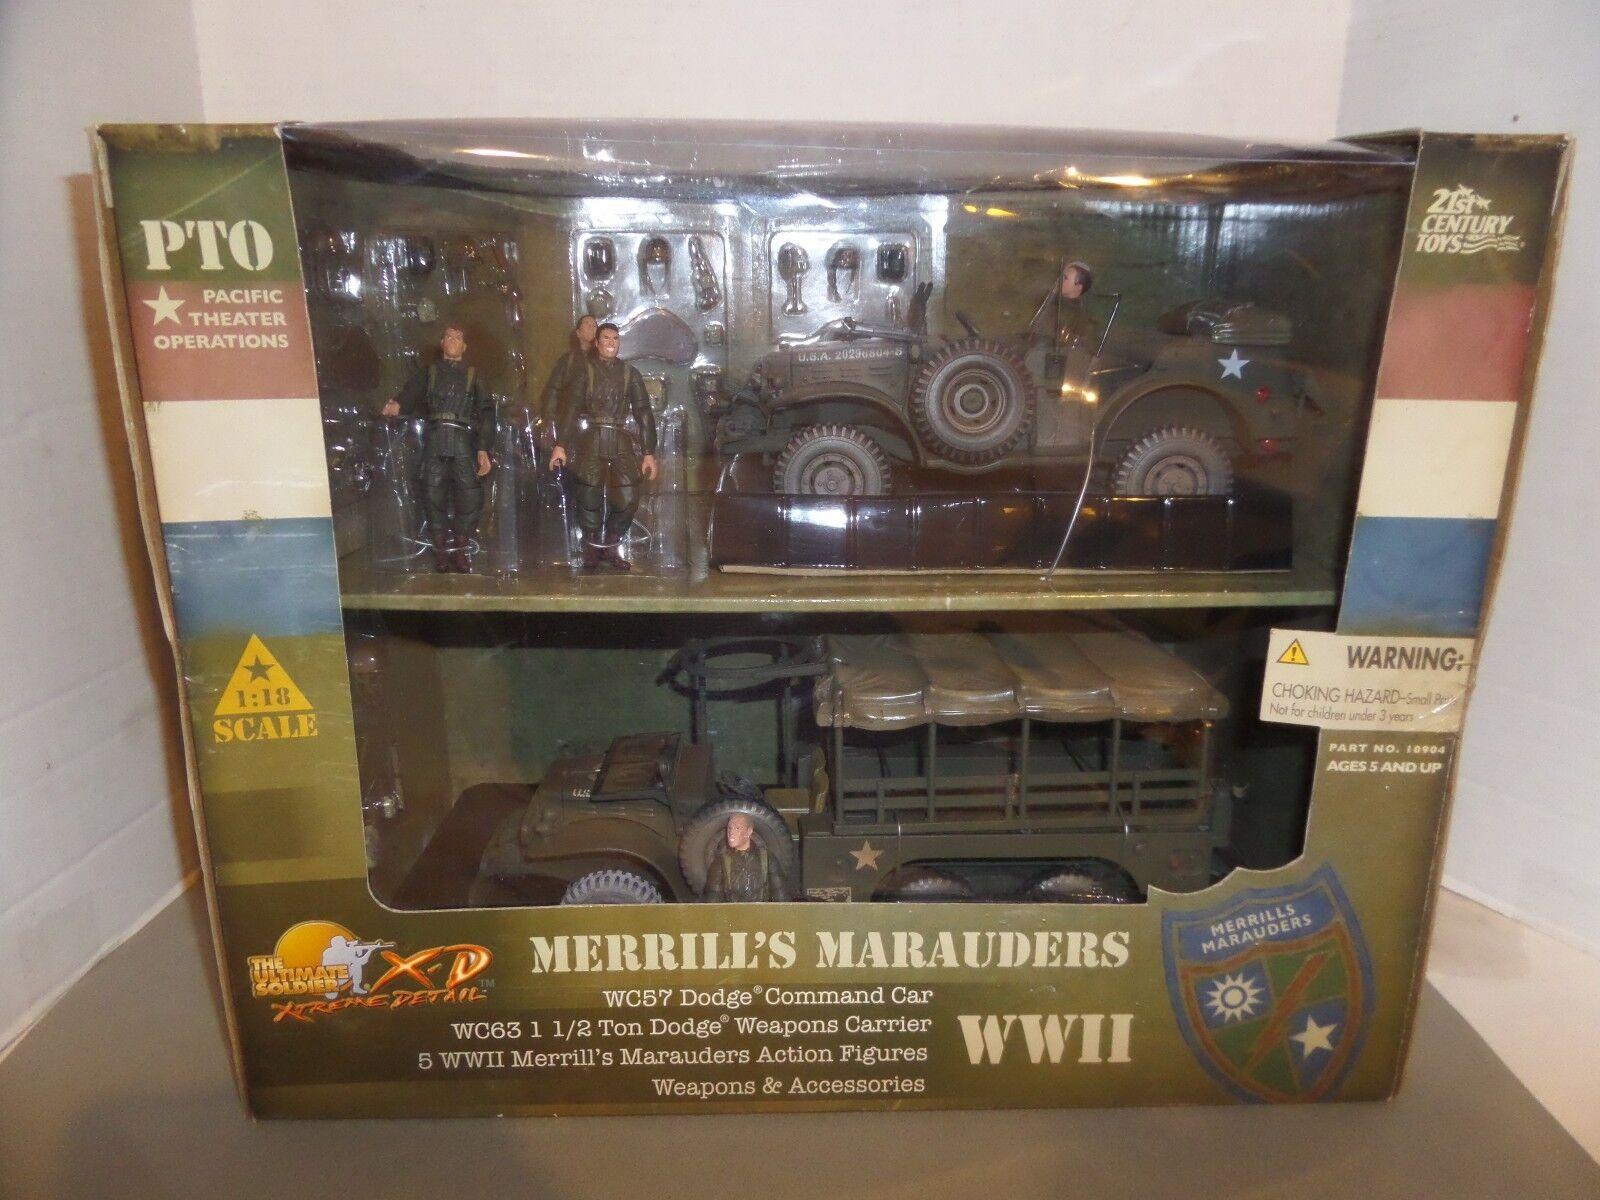 raros Ultimate Soldier Merrills merodeadores escala